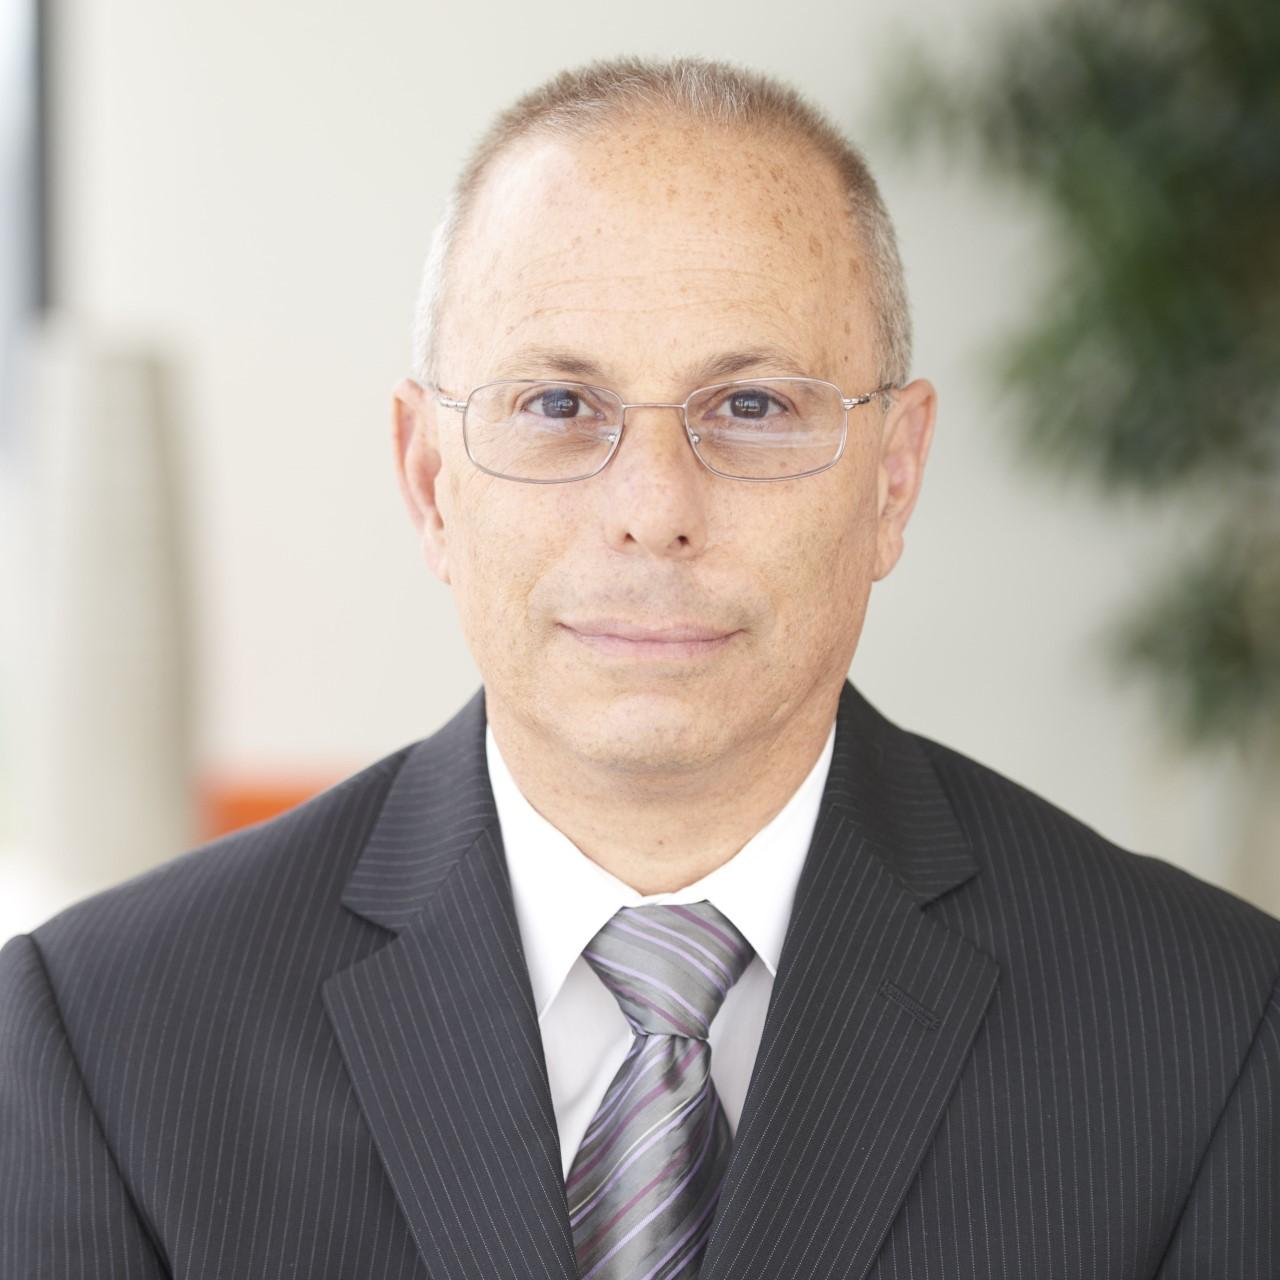 Professor Peter Pitts